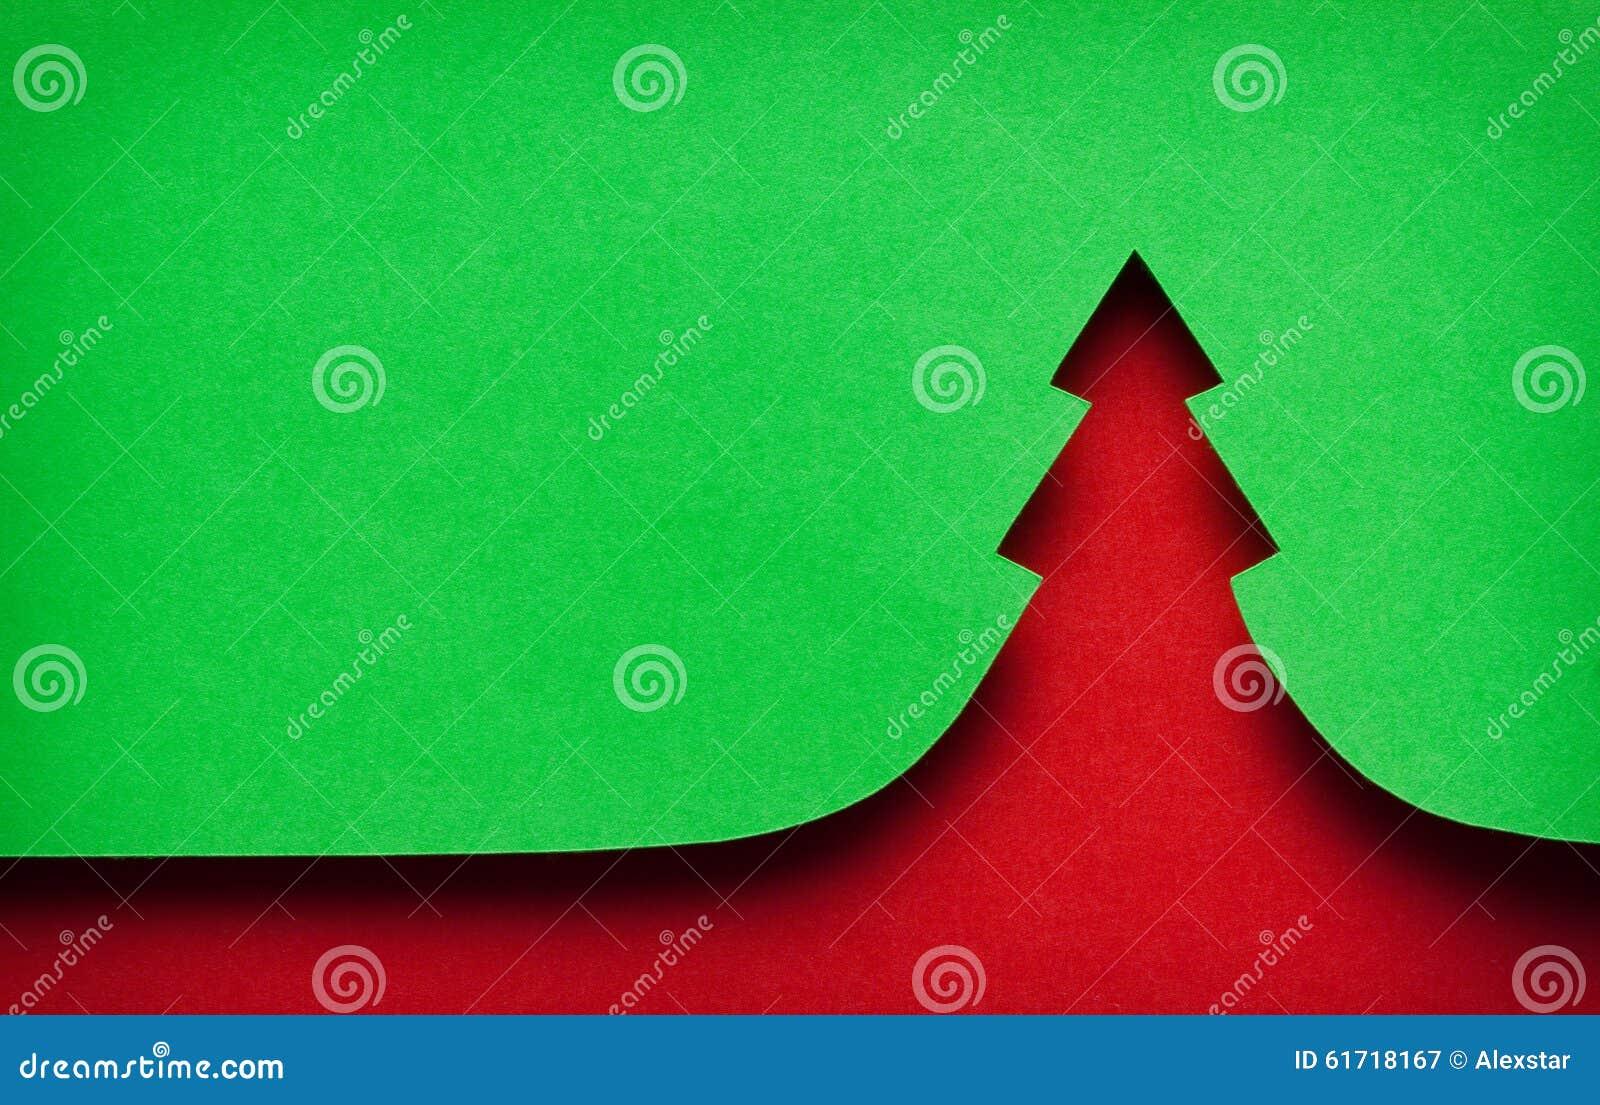 Arbre de Noël de papier